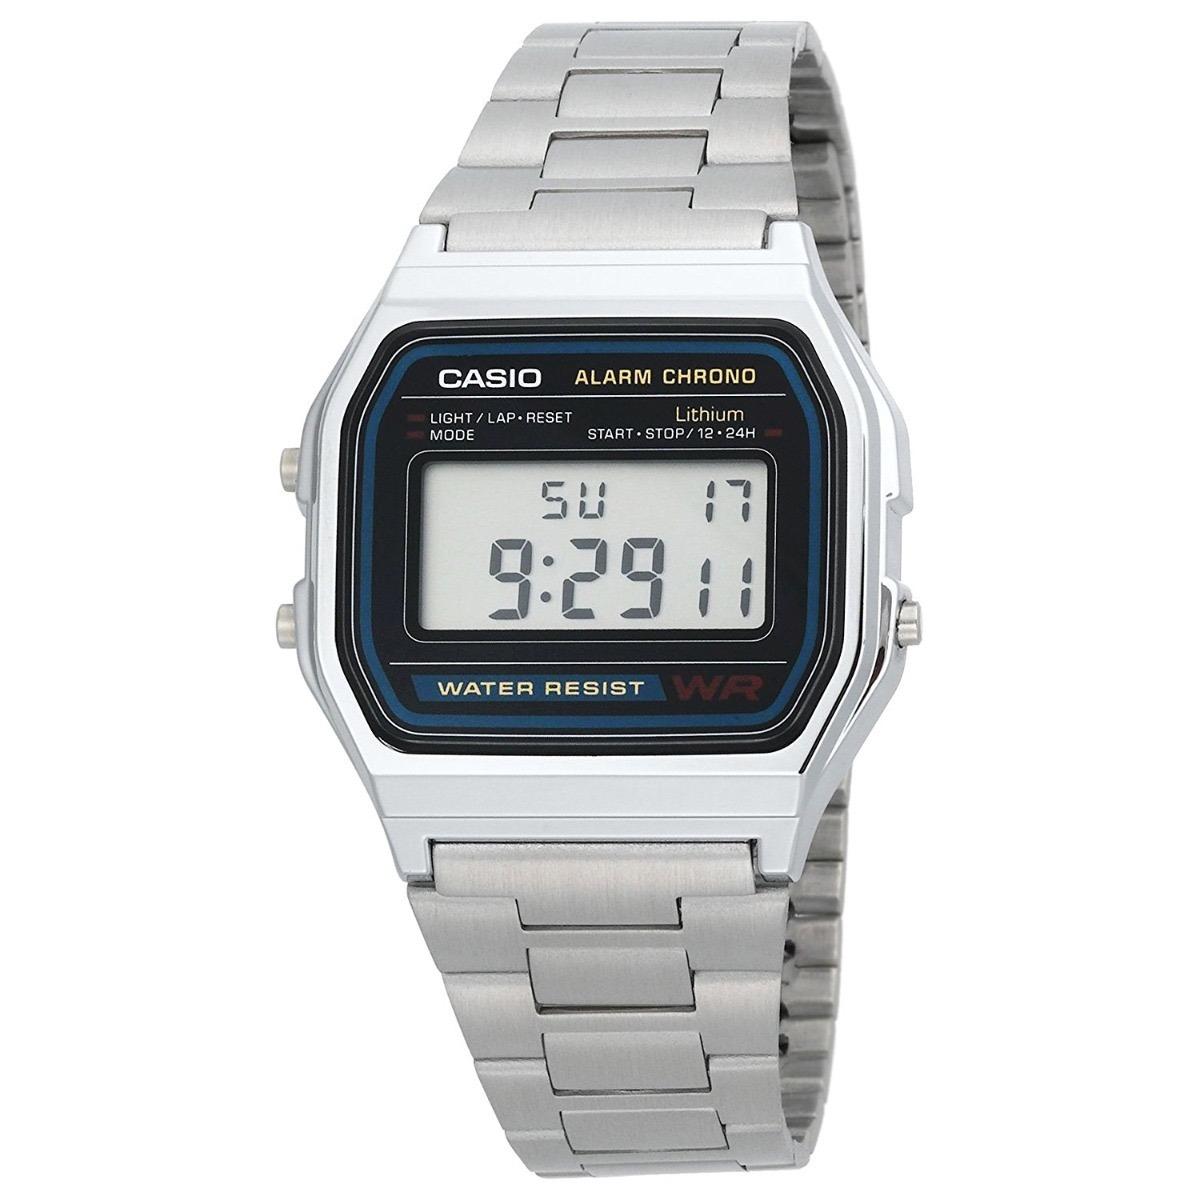 69a3d3b8b18d Reloj Casio A-158wa-1df Retro Pulso Metálico Plata Digital ...